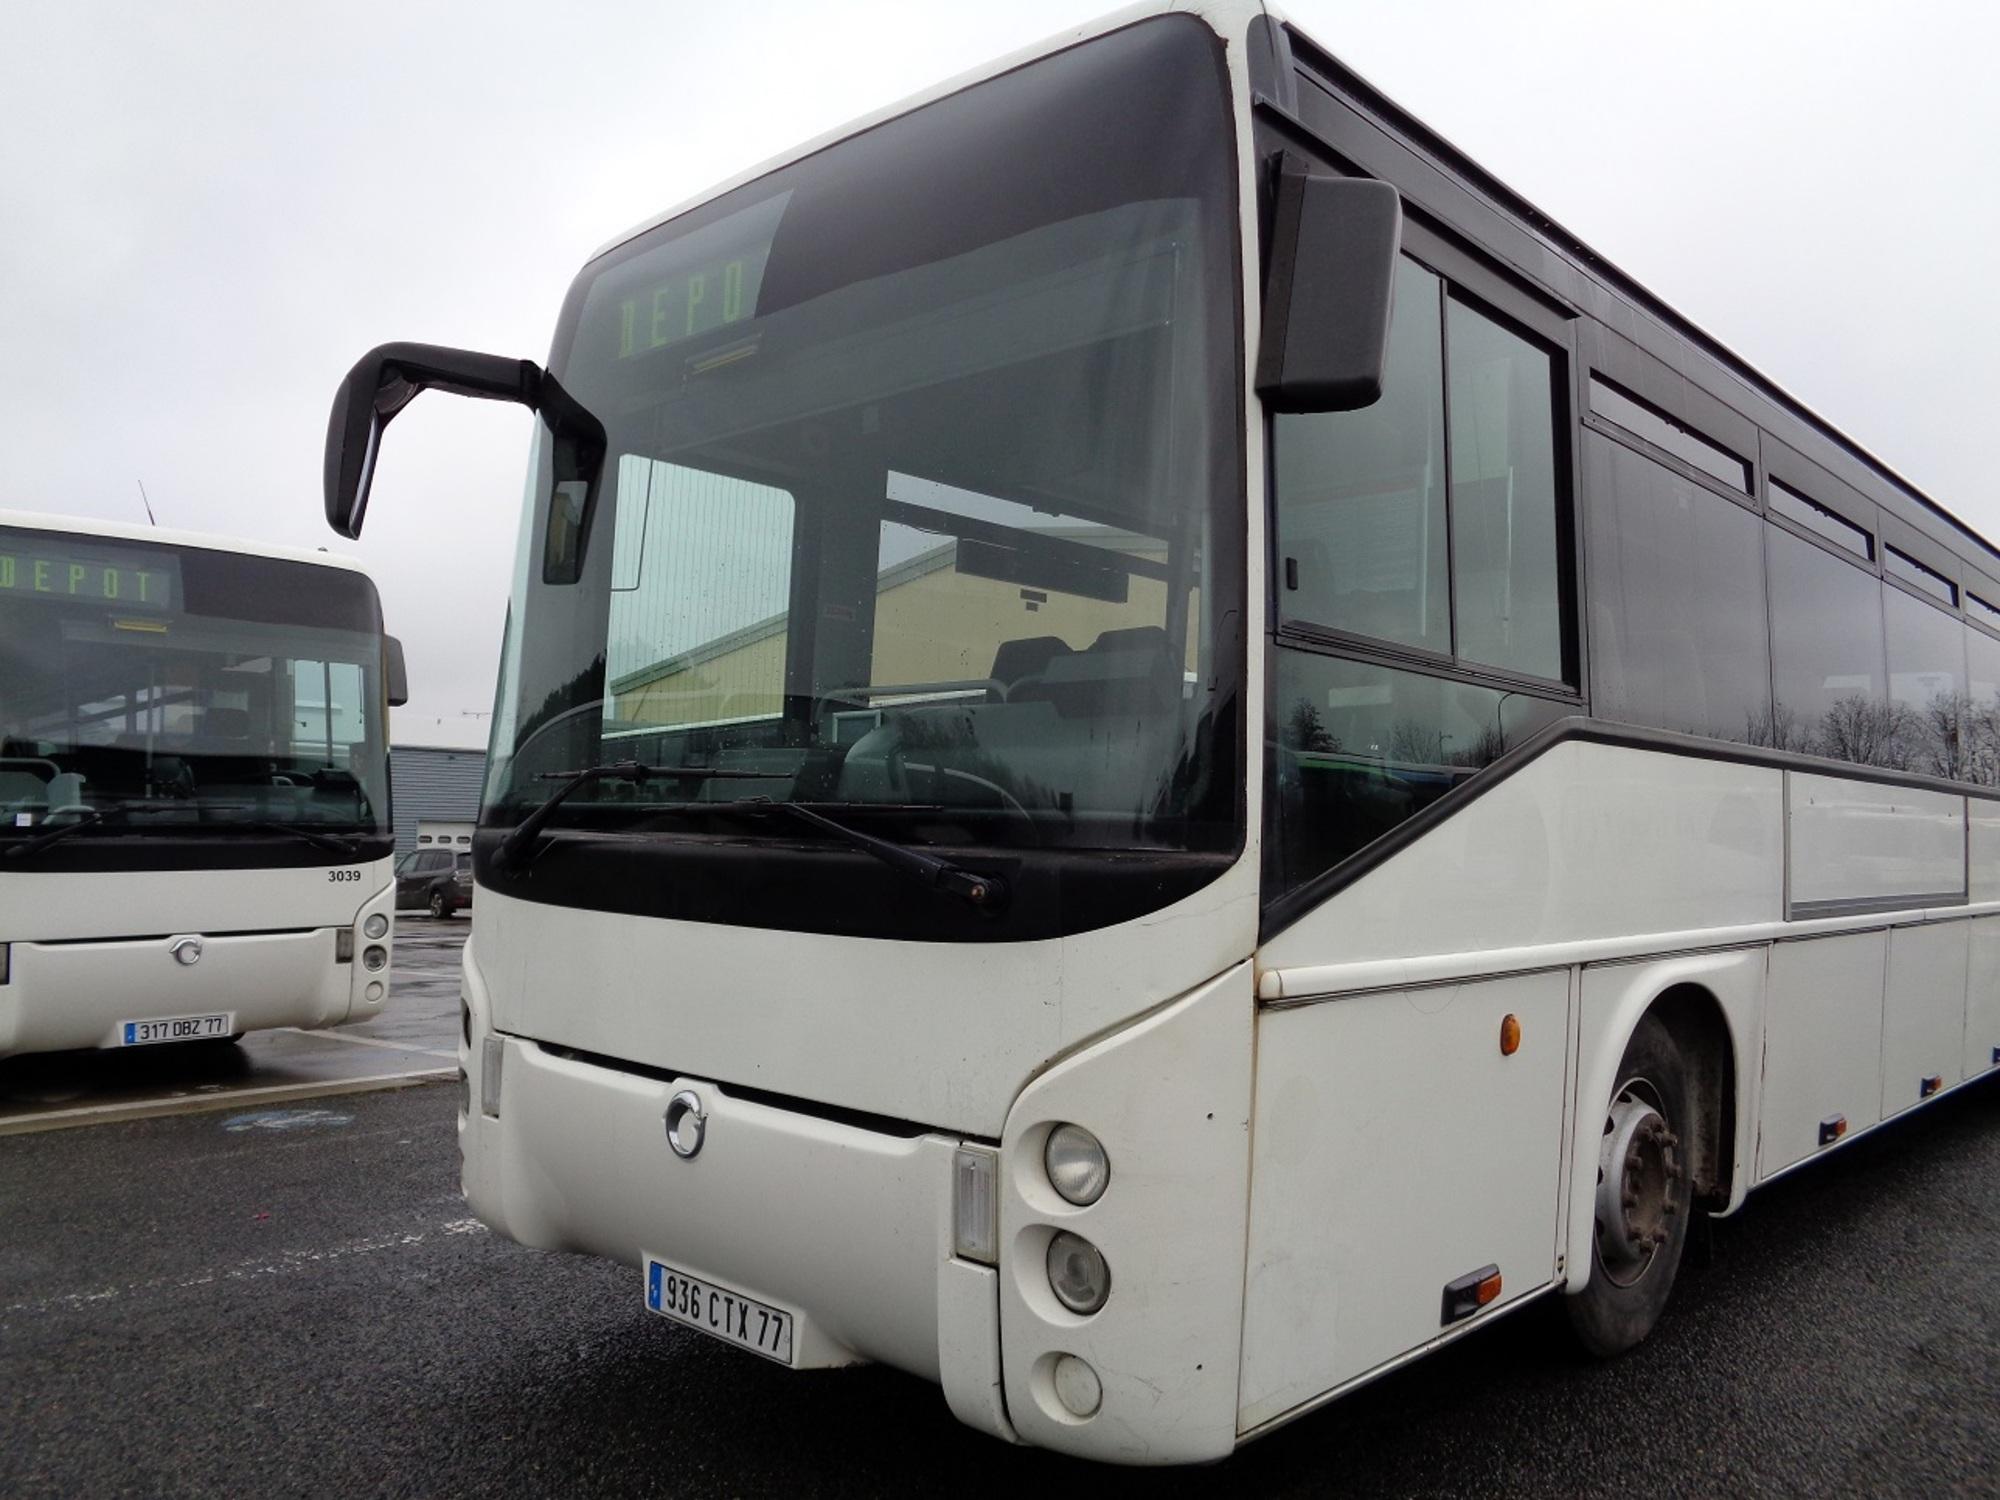 irisbus ares 19652 car bus d 39 occasion aux ench res agorastore. Black Bedroom Furniture Sets. Home Design Ideas